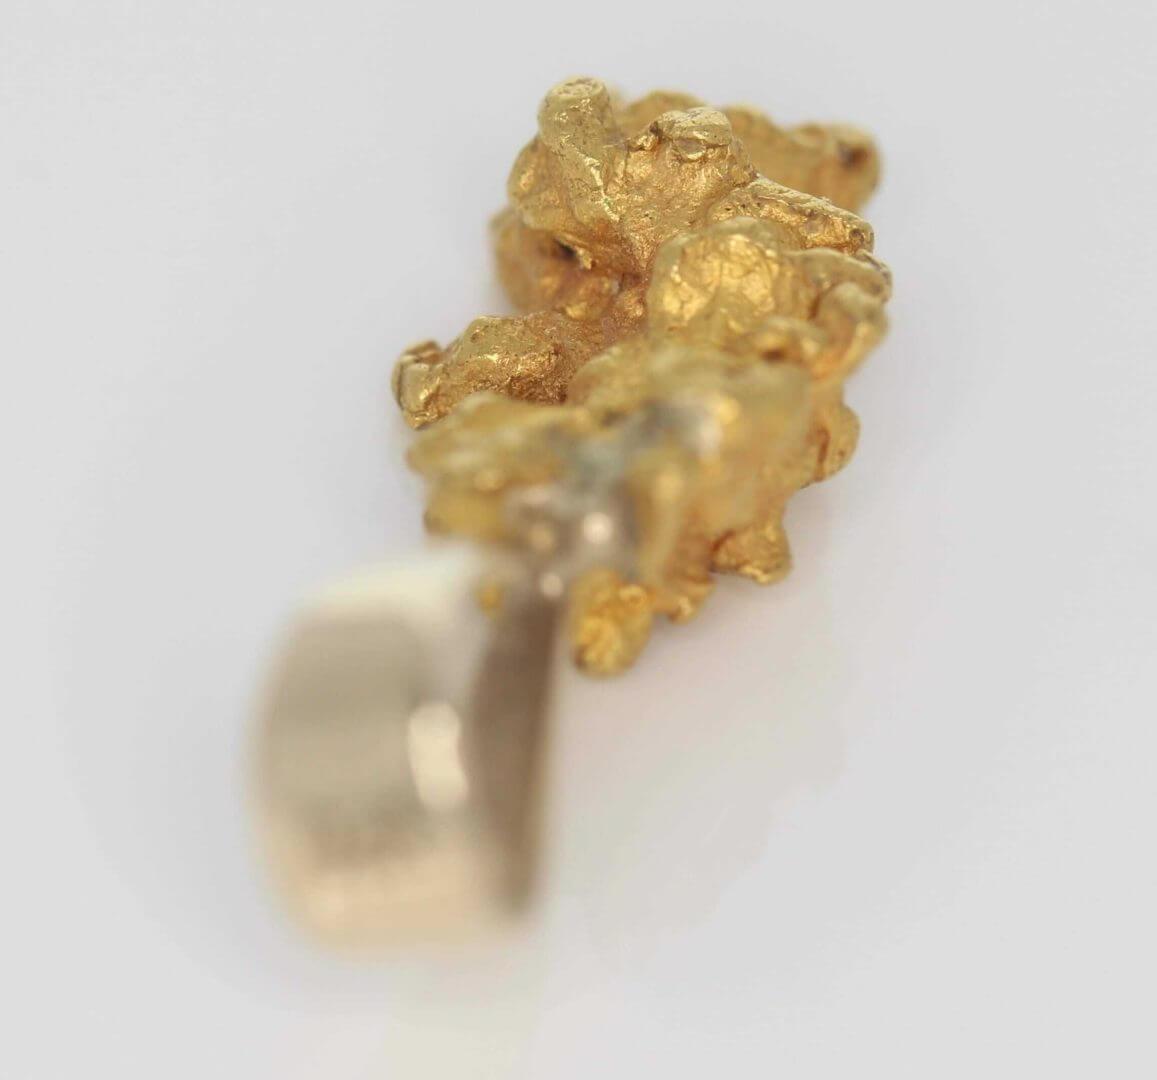 Natural Australian Gold Nugget Pendant - 4.50g 6